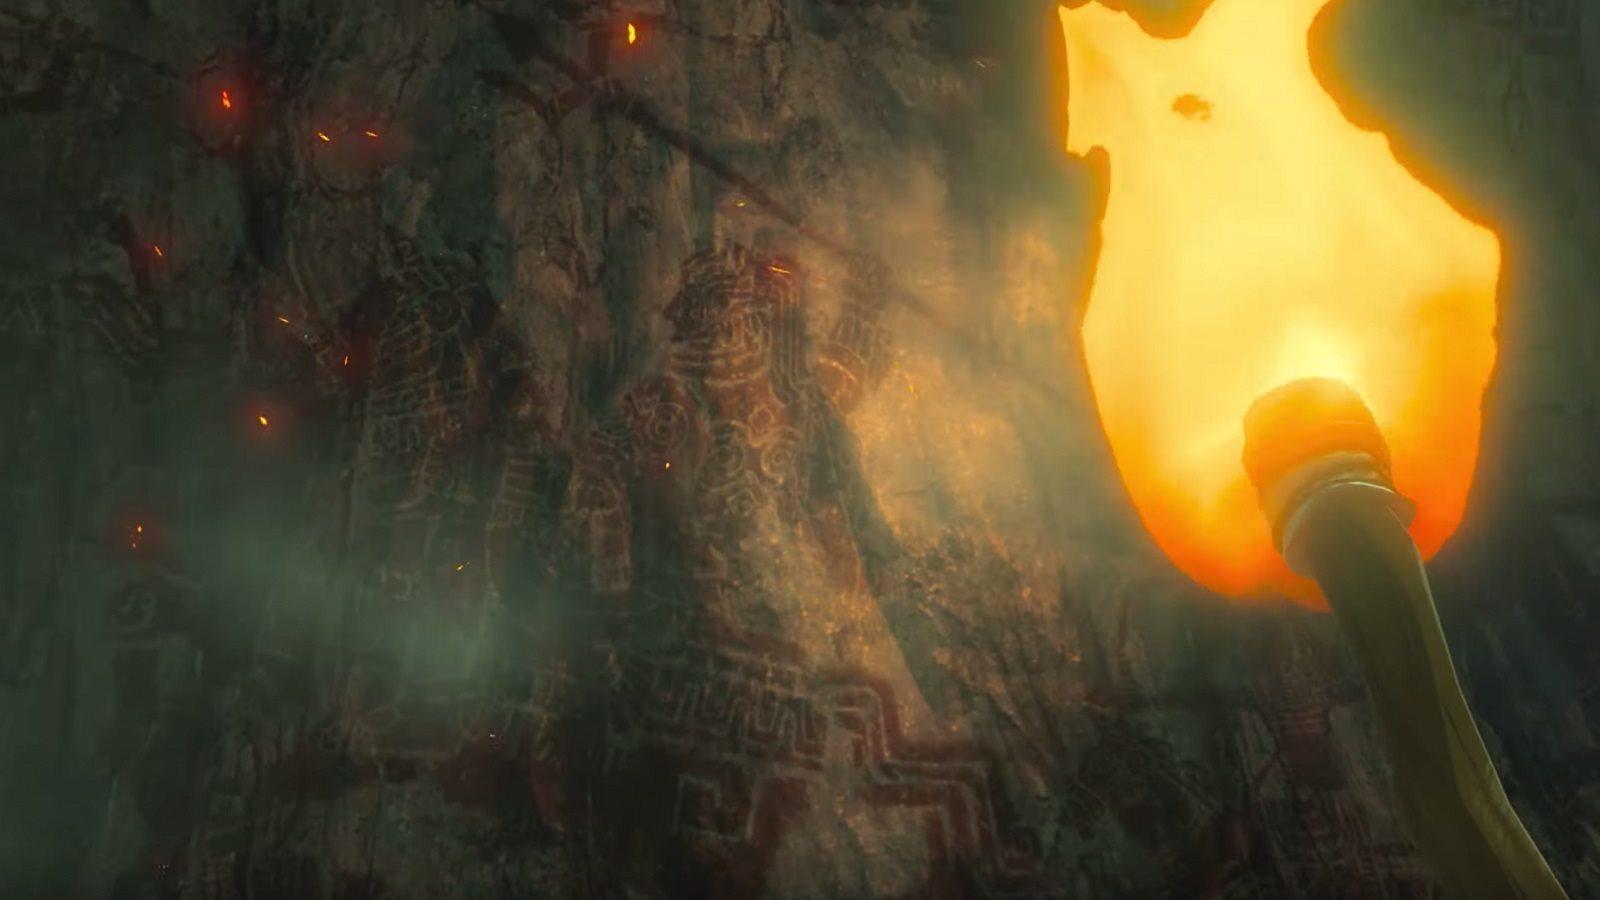 Legend of Zelda: Breath of the Wild 2; trailer: ancient armor